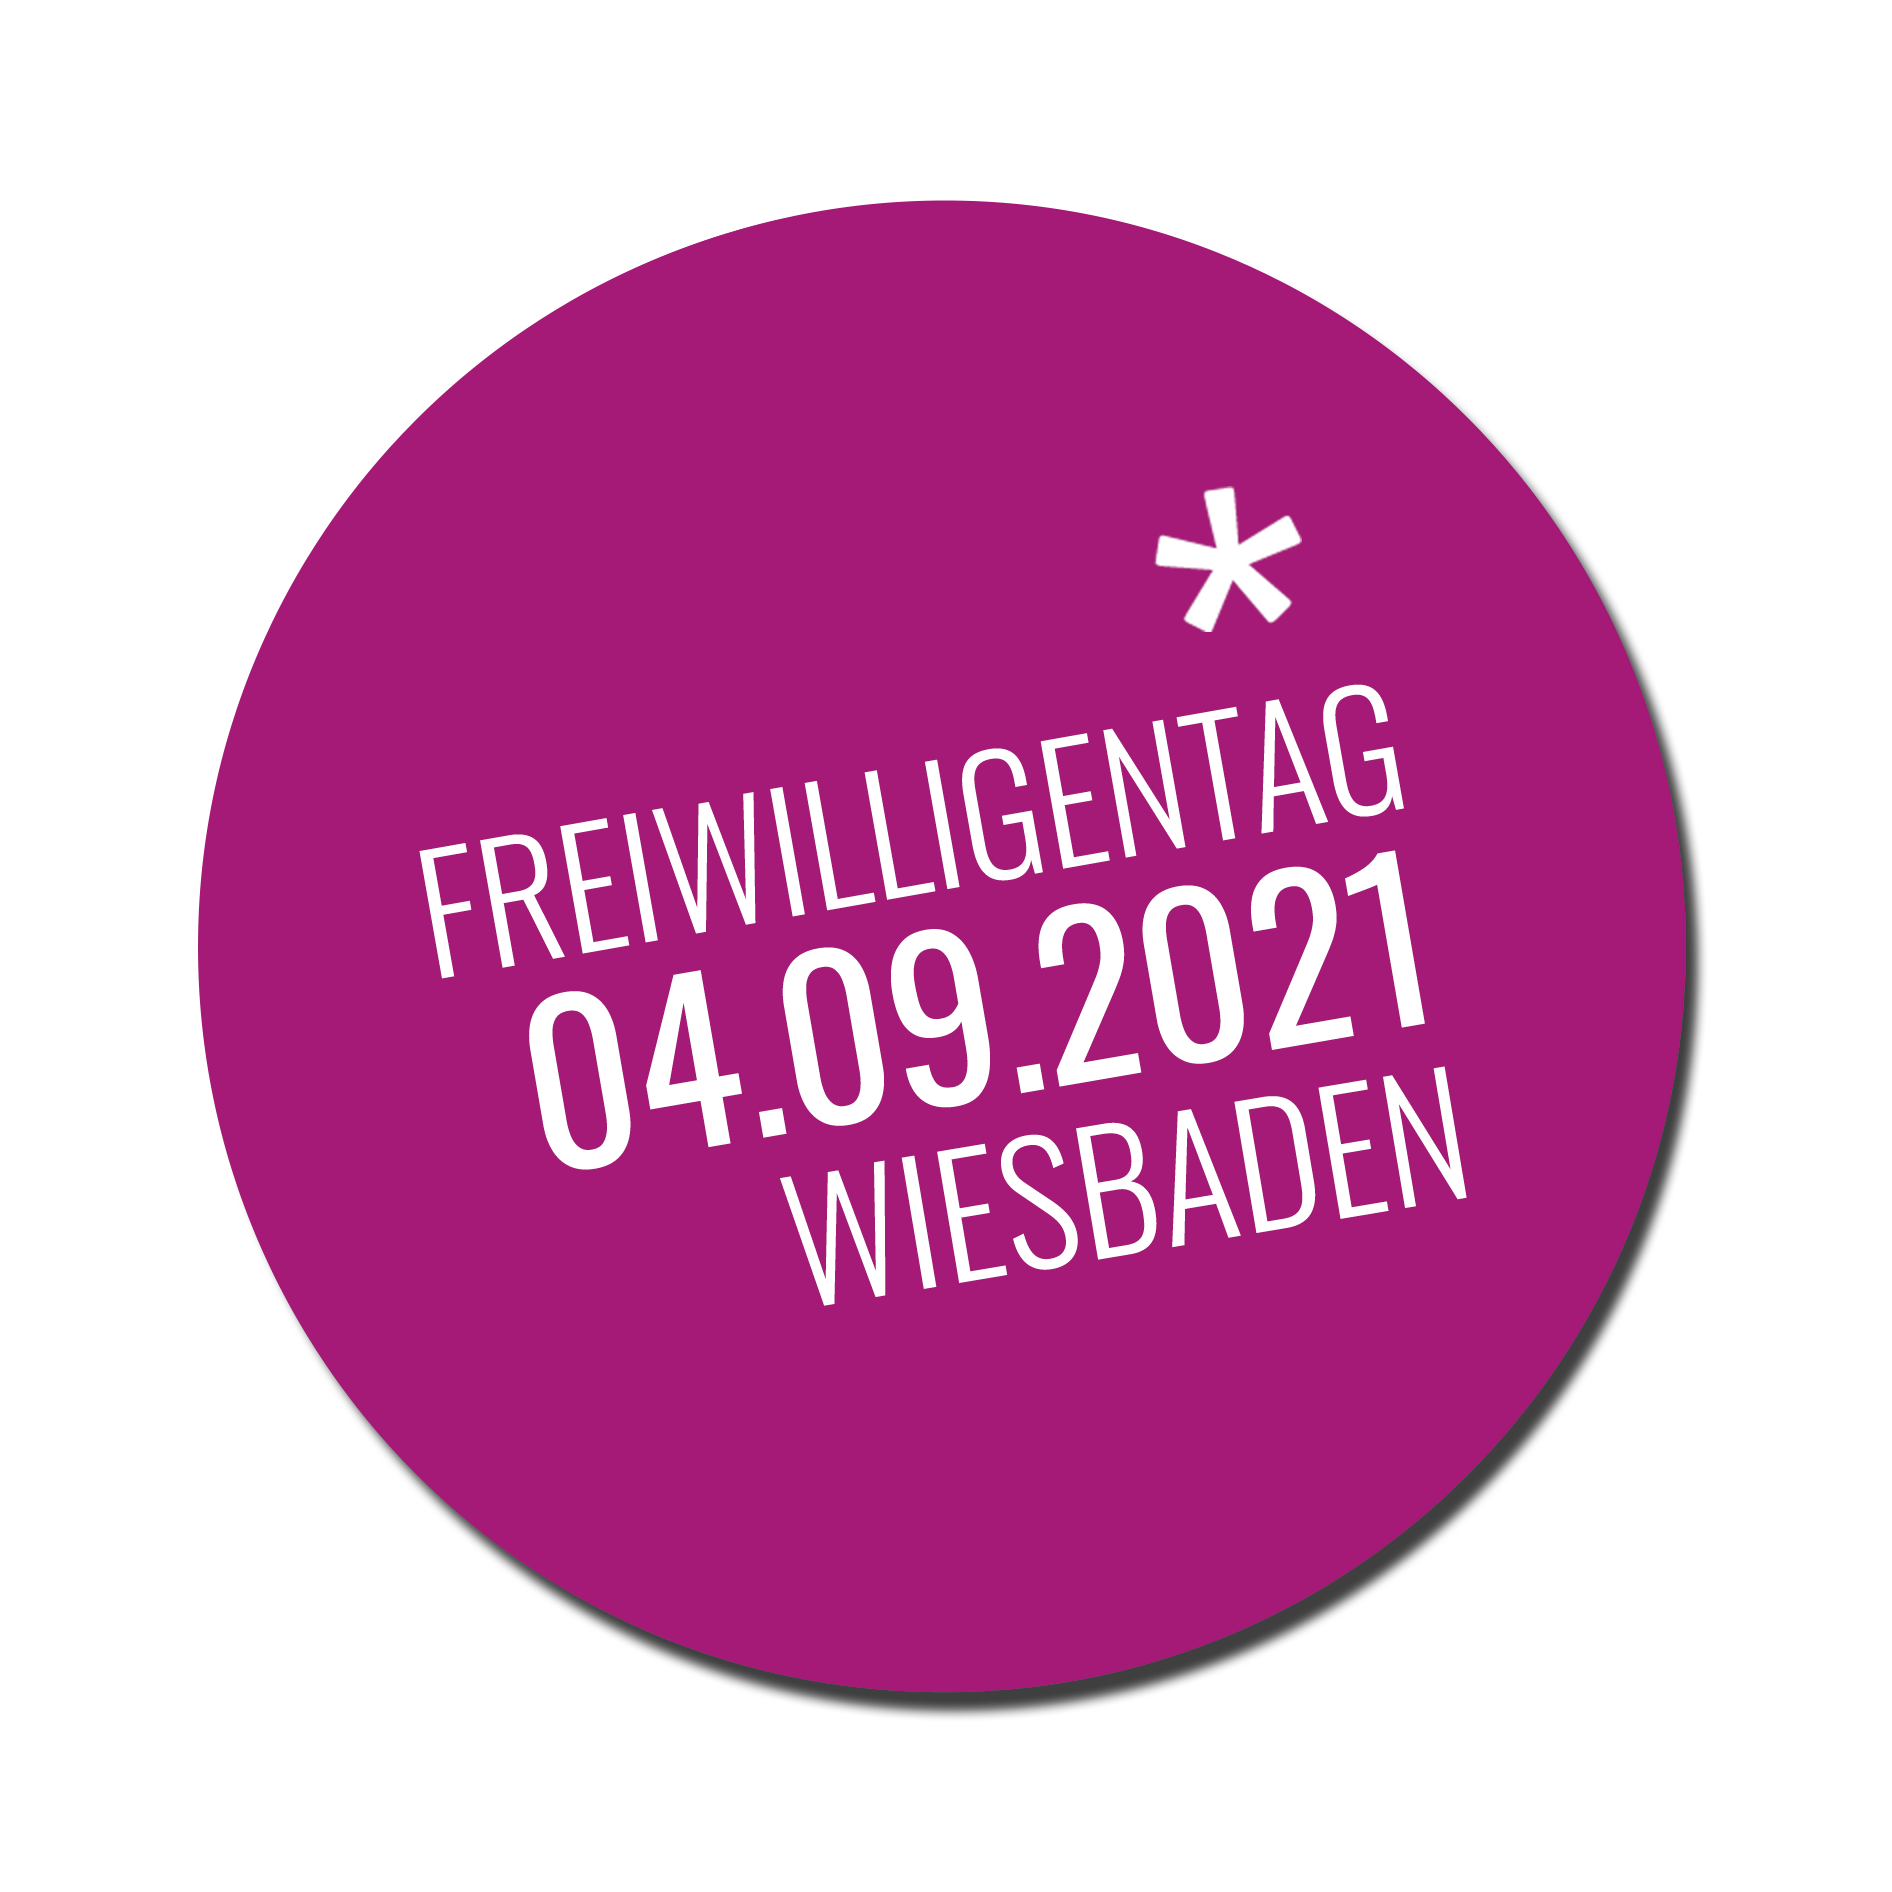 Freiwilligentag Header-Logo Rechts